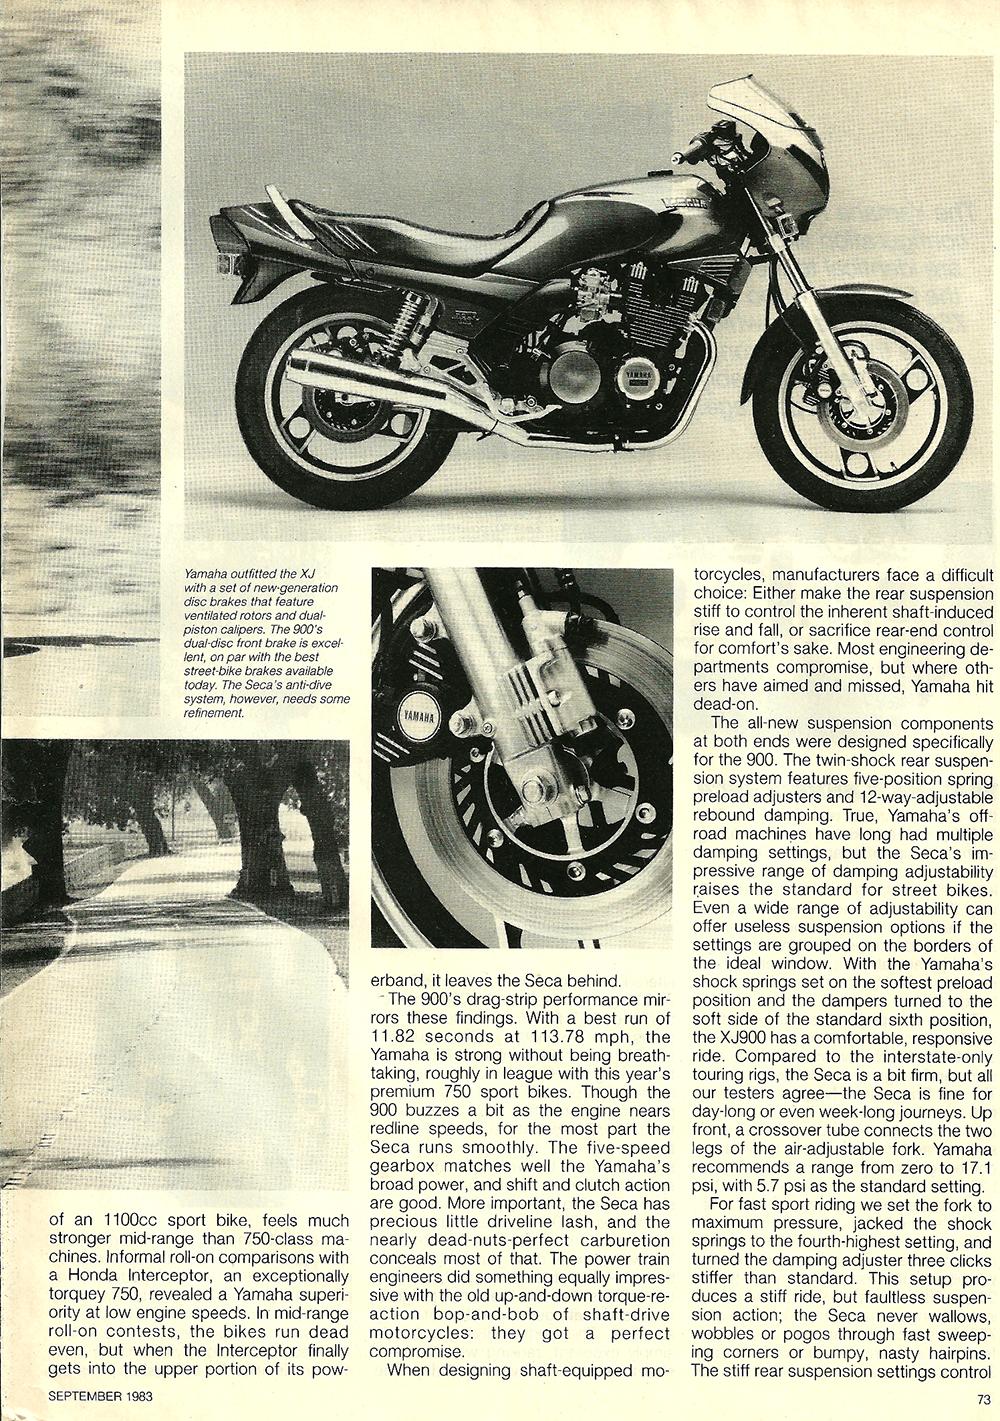 1983 Yamaha XJ900RK Seca road test 4.jpg